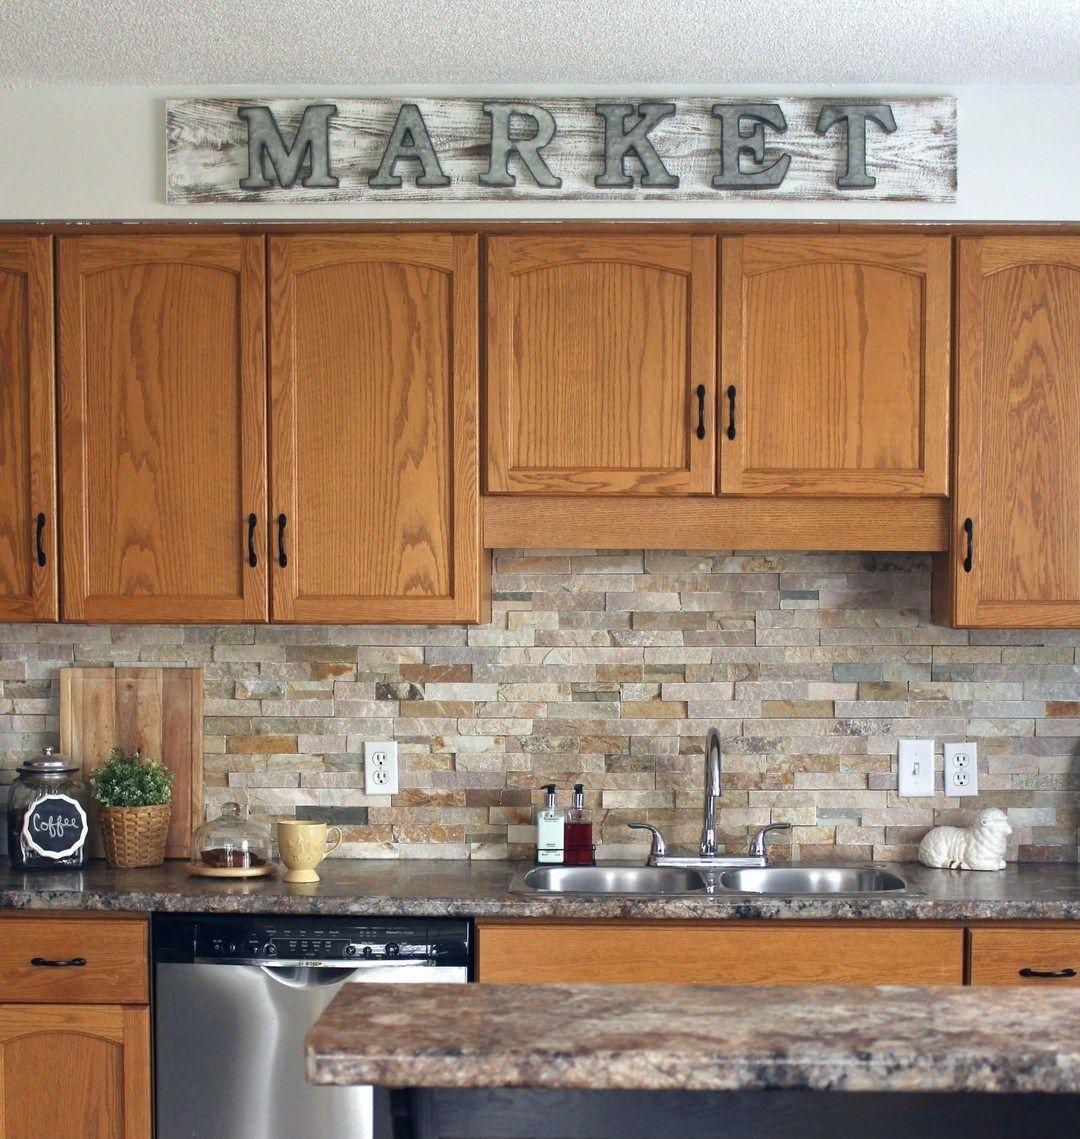 Knotted Oak Kitchen Cabinets: 29 Fantastic Kitchen Backsplash Ideas With Oak Cabinets (4